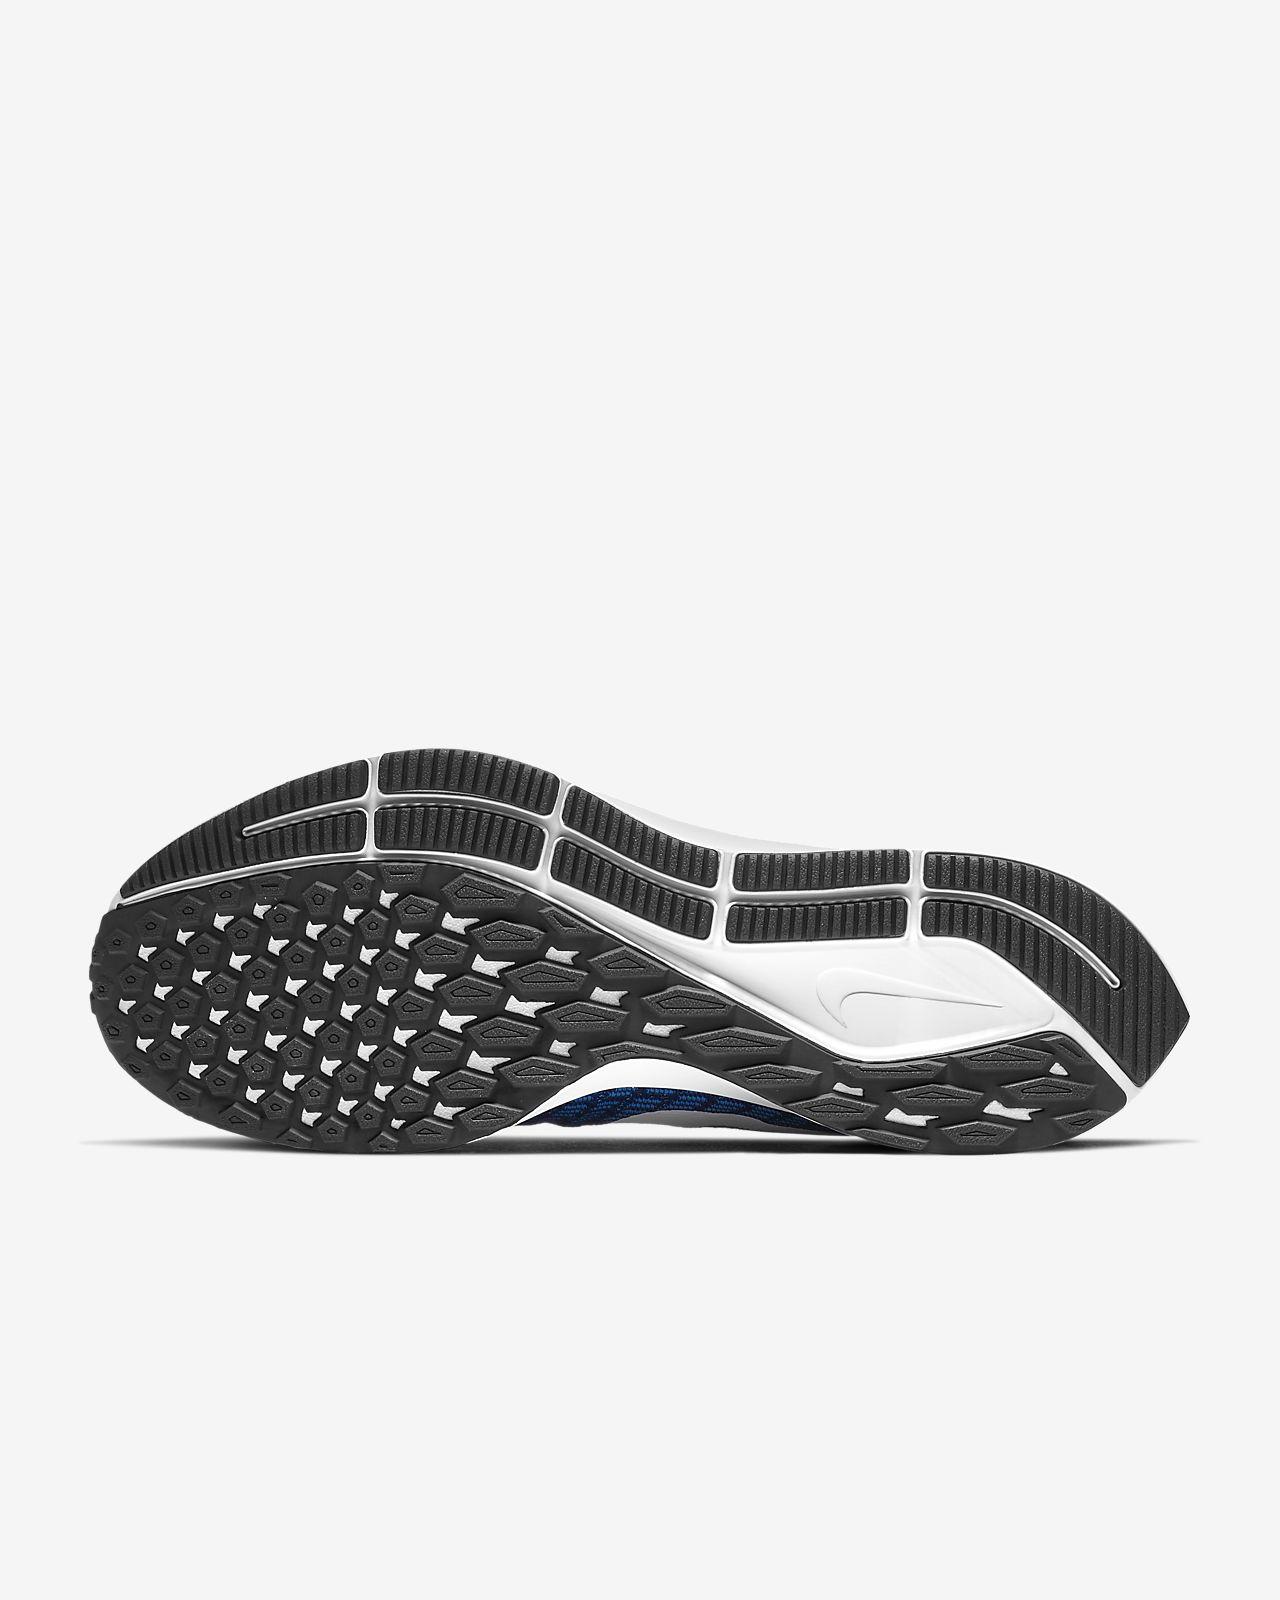 online store 86b94 fd88f ... Calzado de running para hombre Nike Air Zoom Pegasus 35